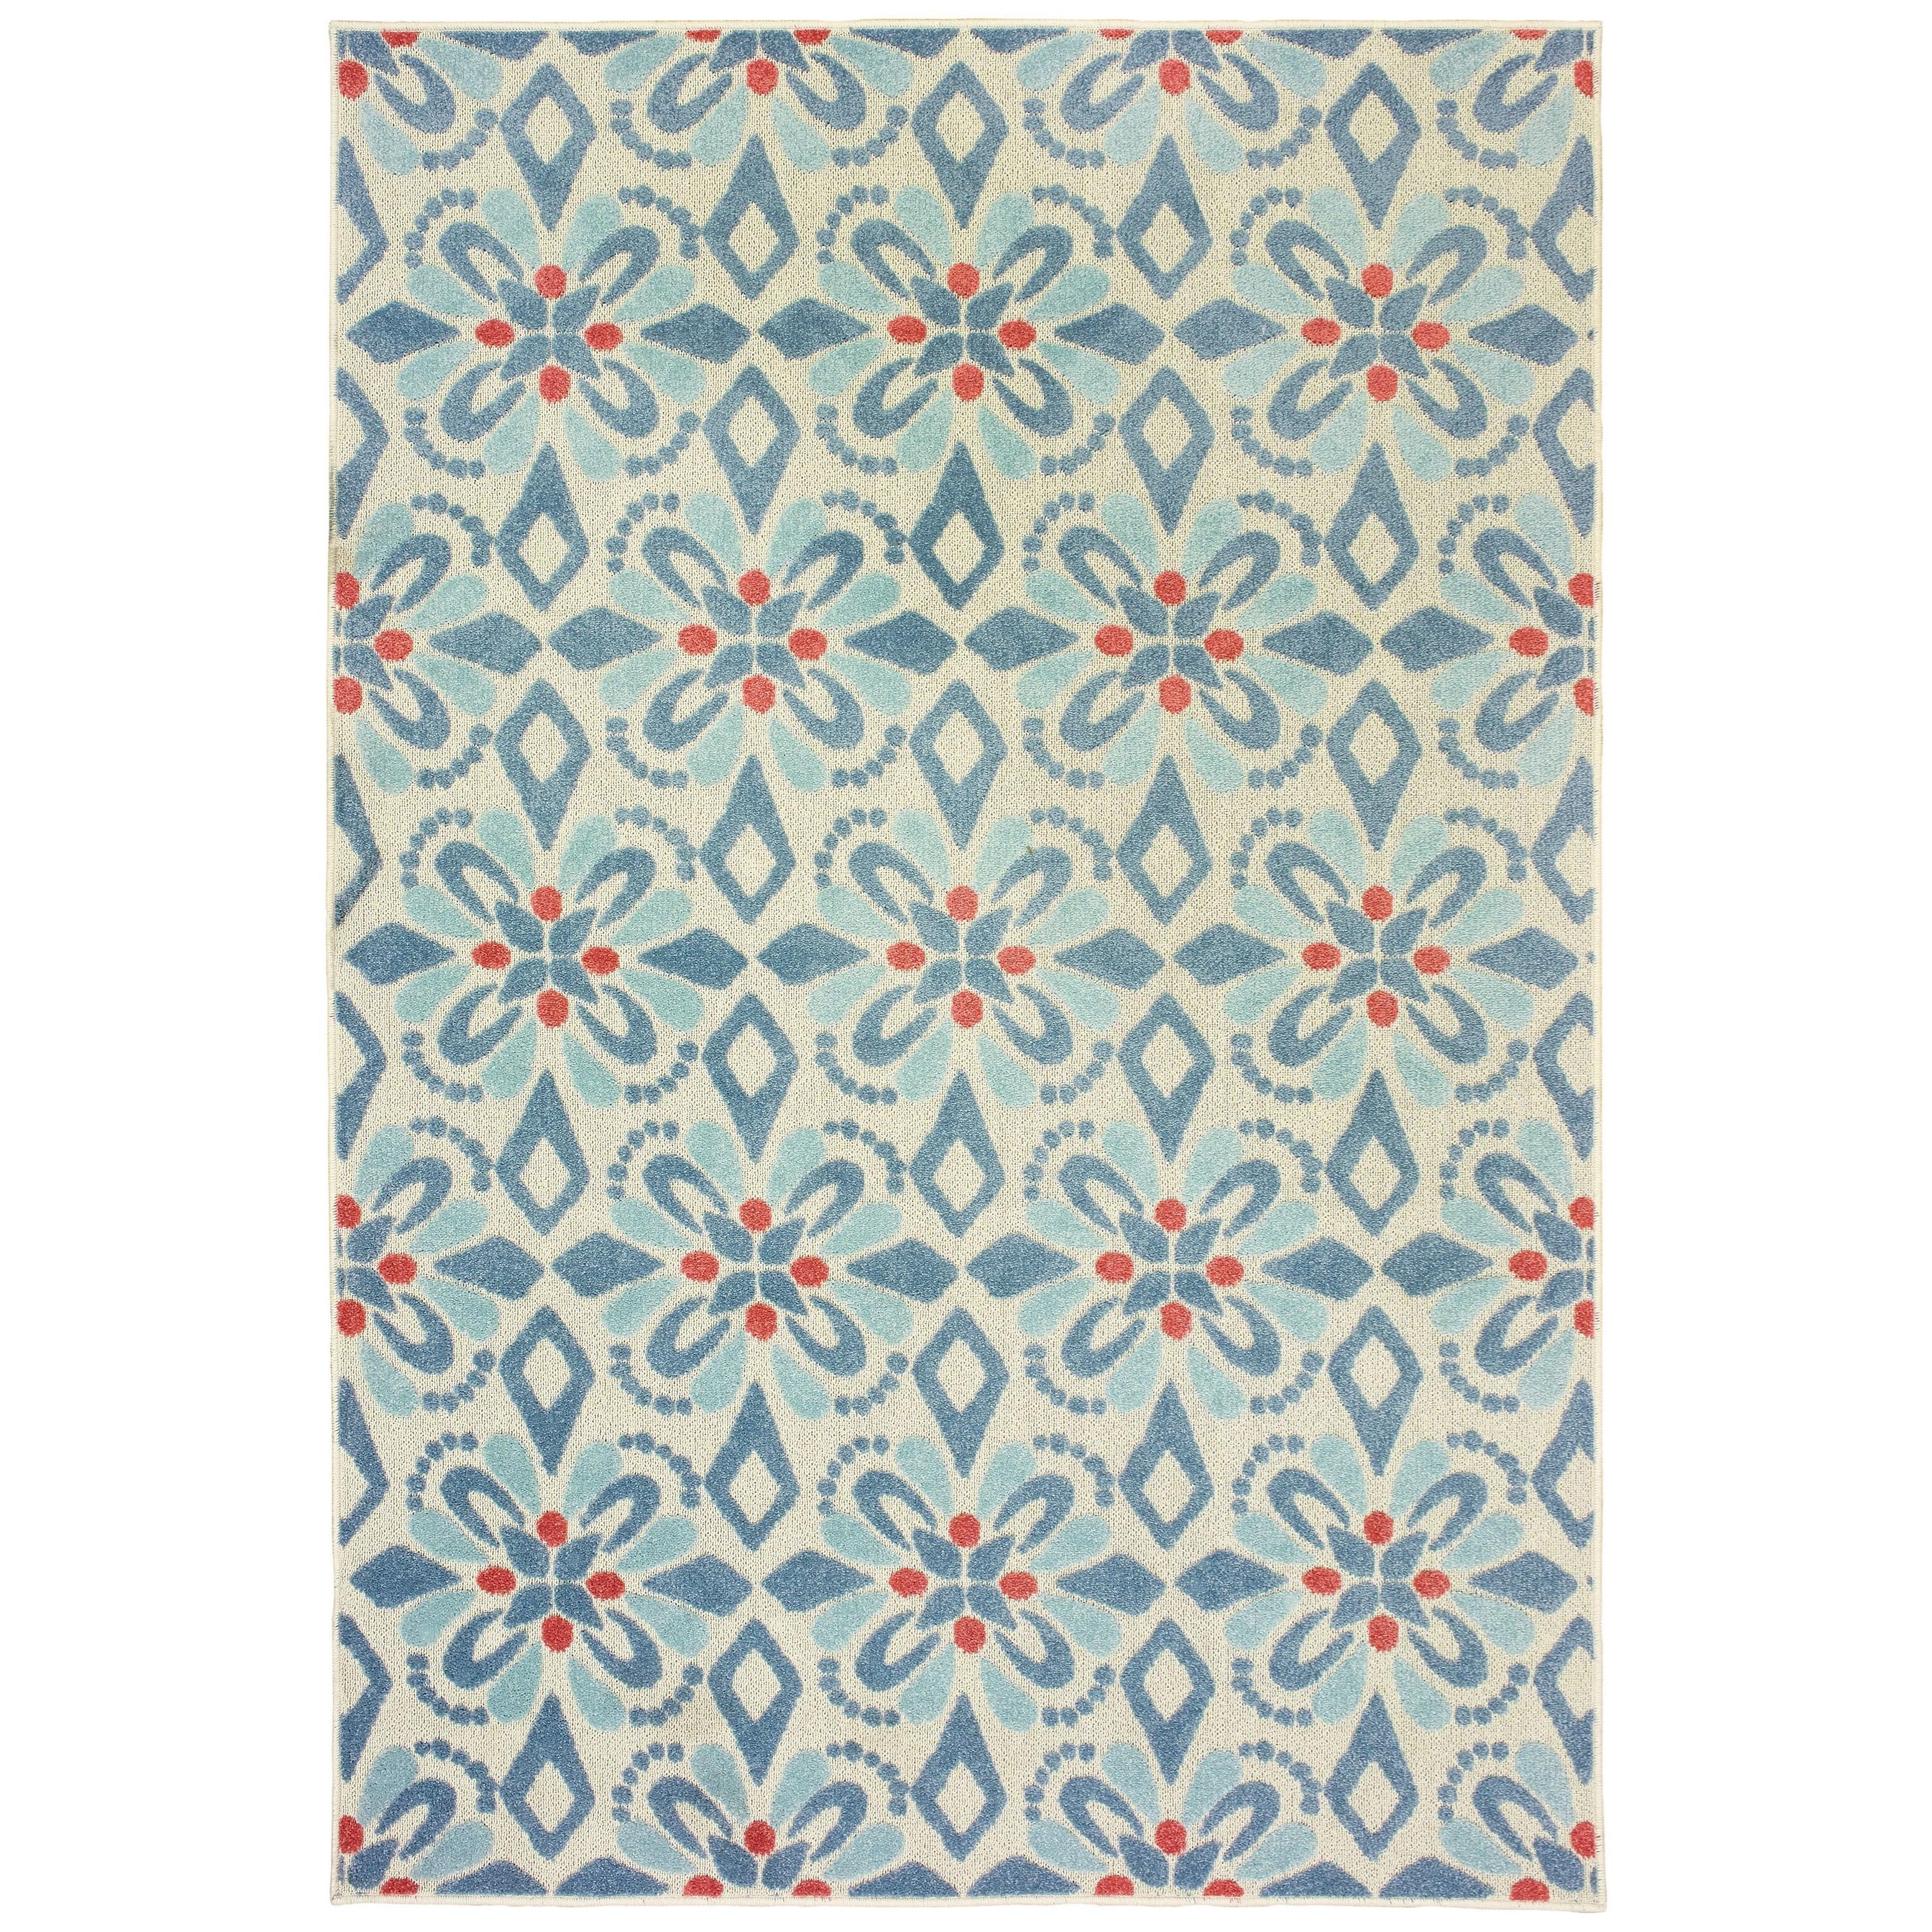 "Barbados 5' 3"" X 7' 6"" Rug by Oriental Weavers at HomeWorld Furniture"